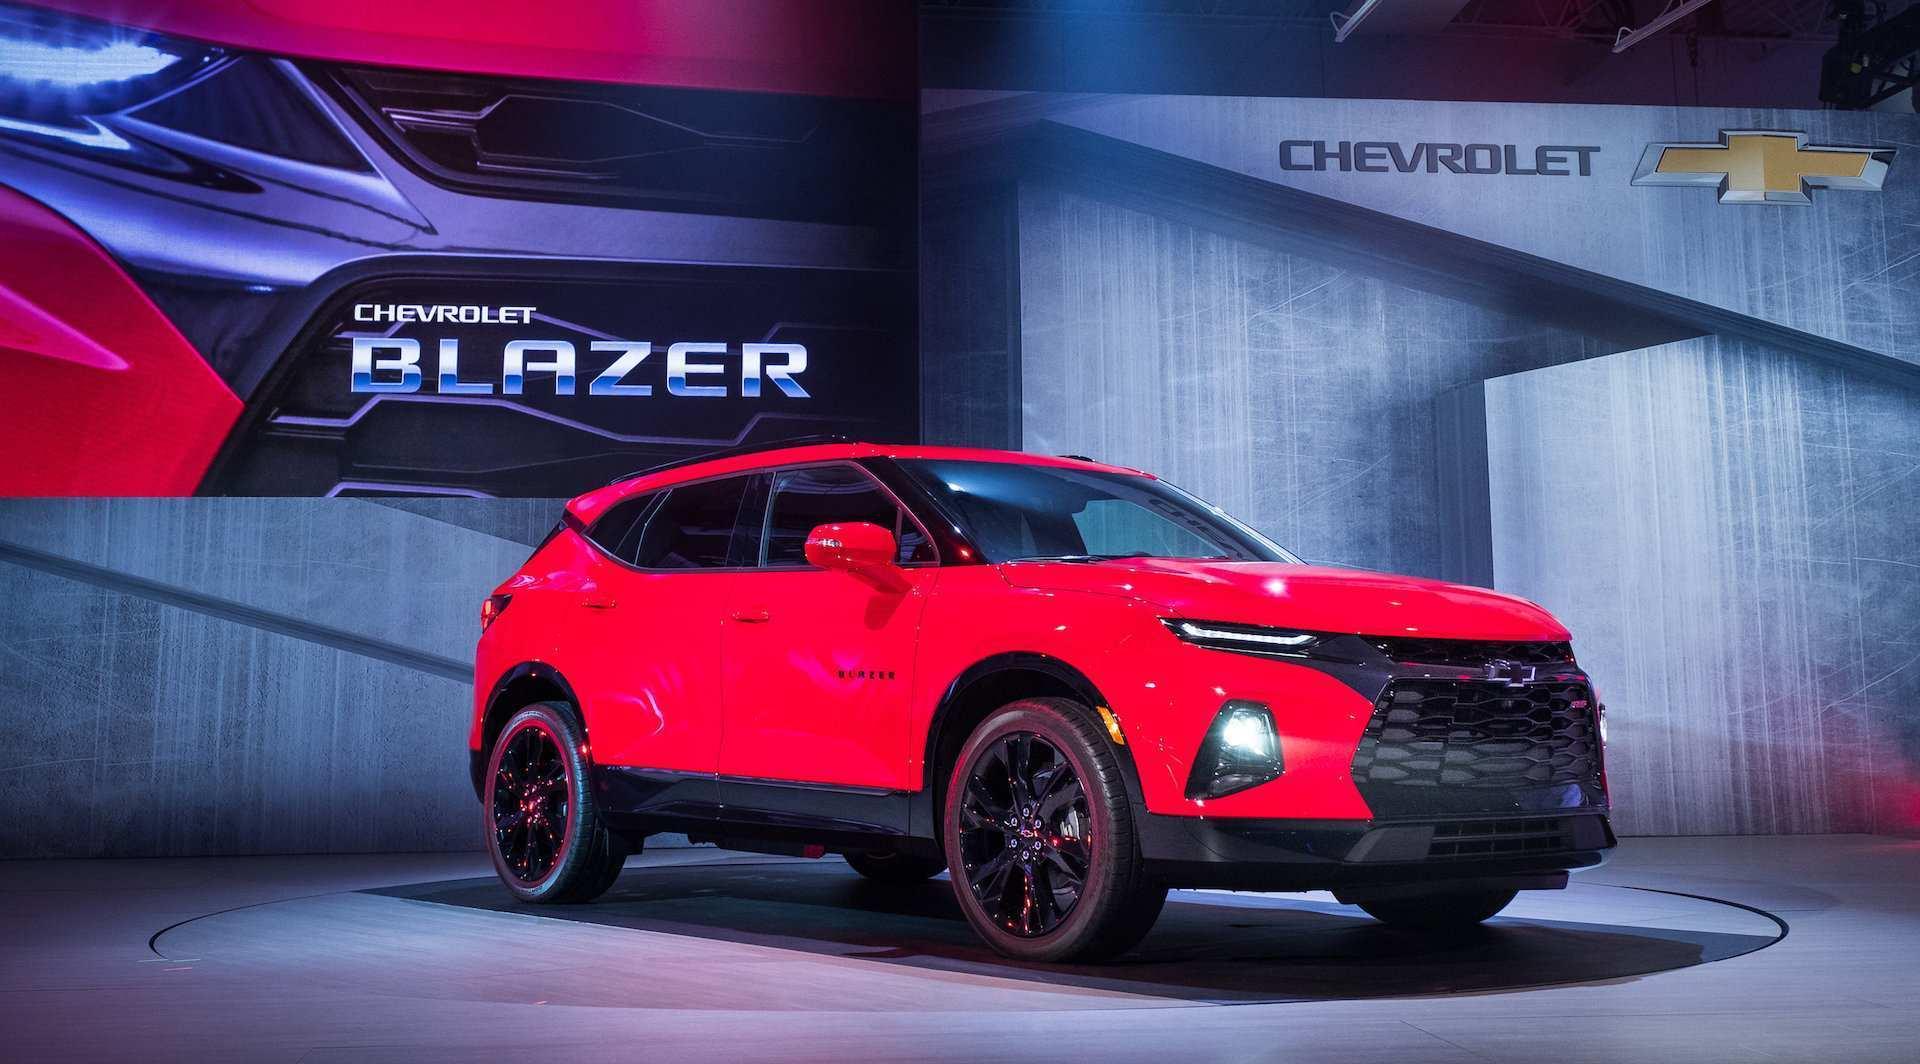 62 Best Review New Nueva Chevrolet 2019 Release Date Ratings with New Nueva Chevrolet 2019 Release Date